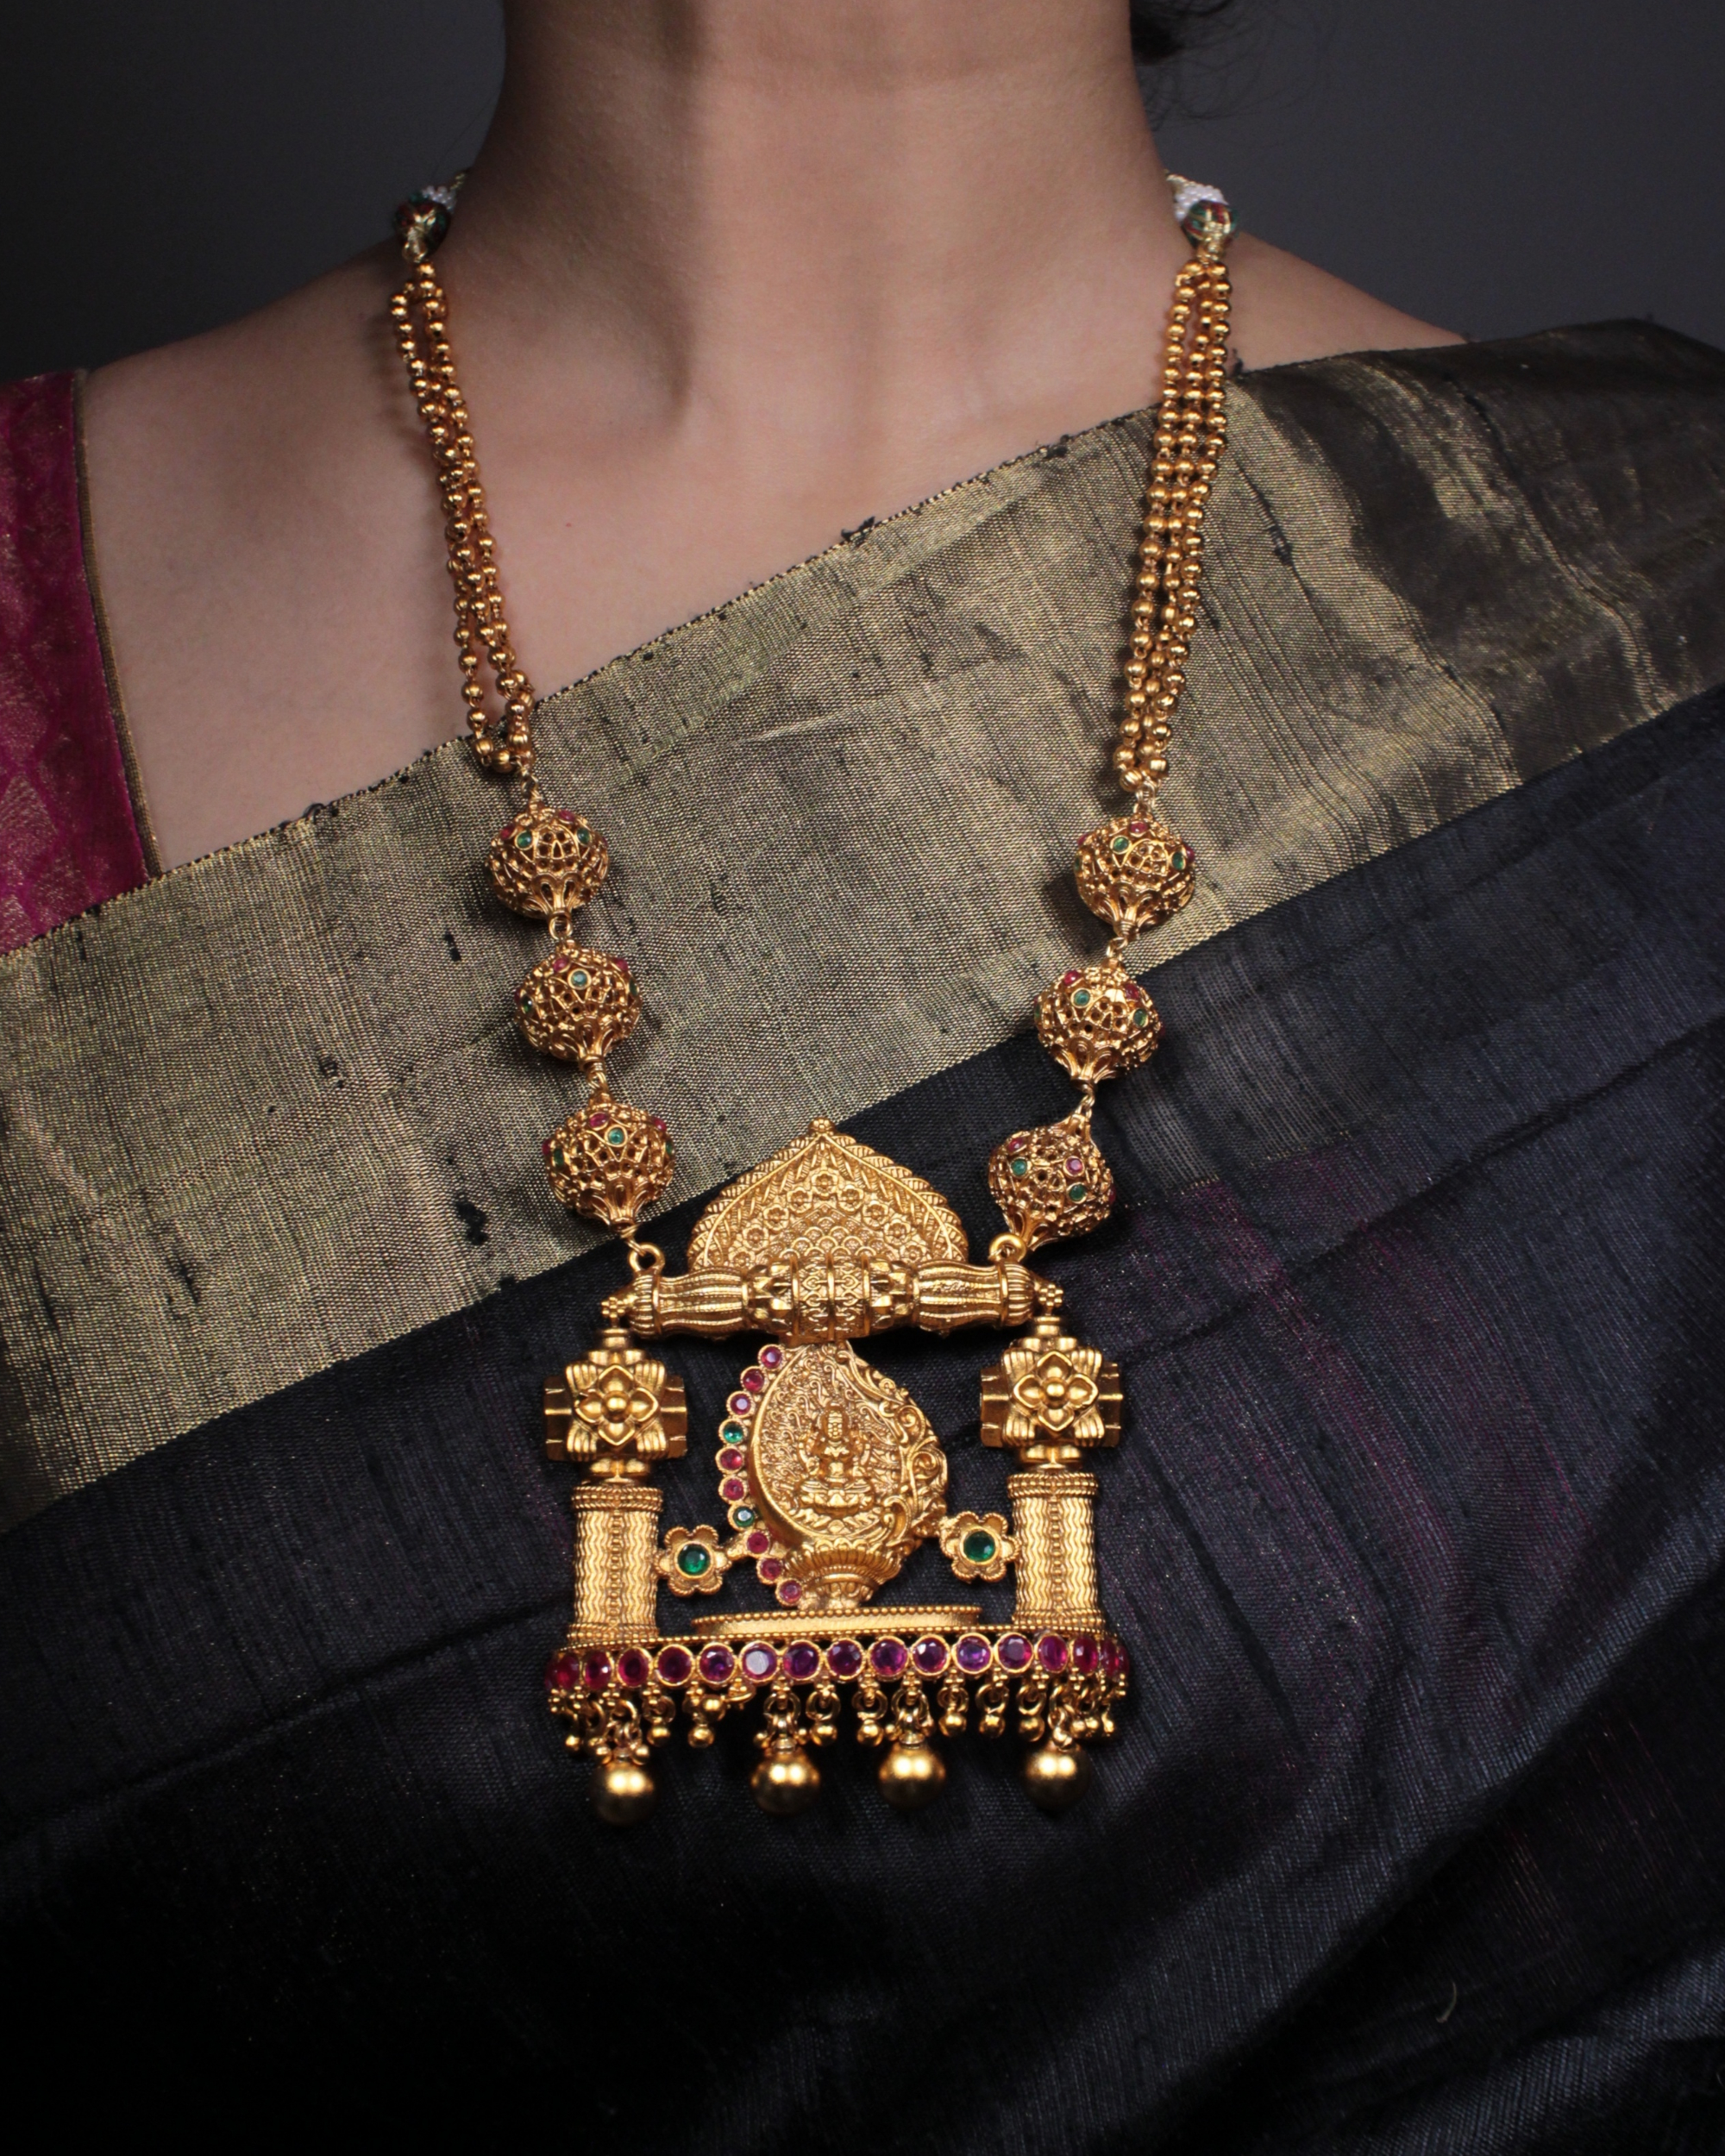 Lakshmi temple motif necklace and earrings set - set of two